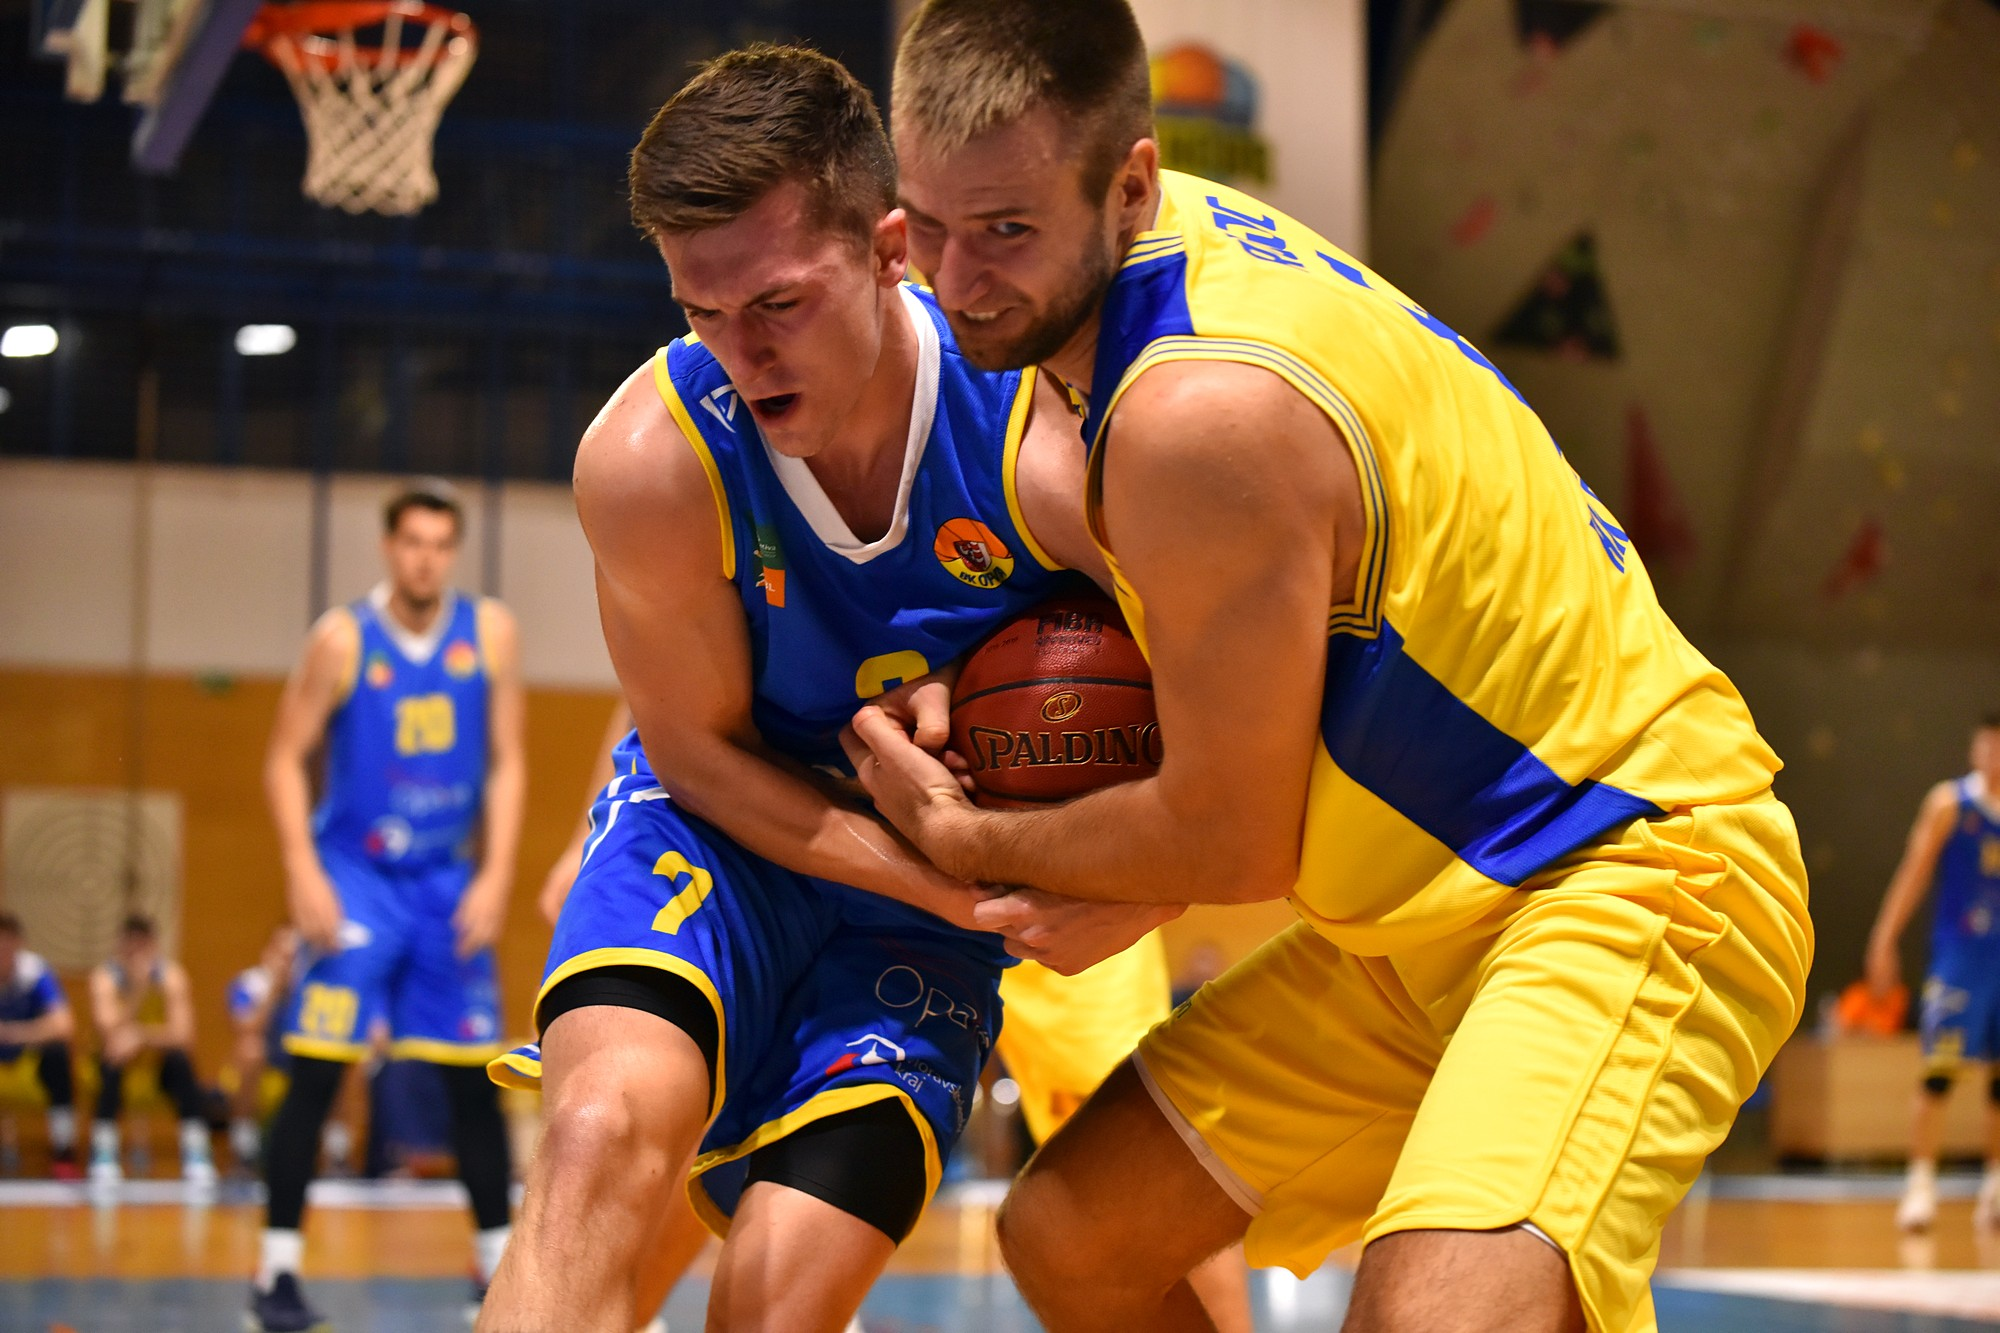 Opava wins Overtime-Thriller